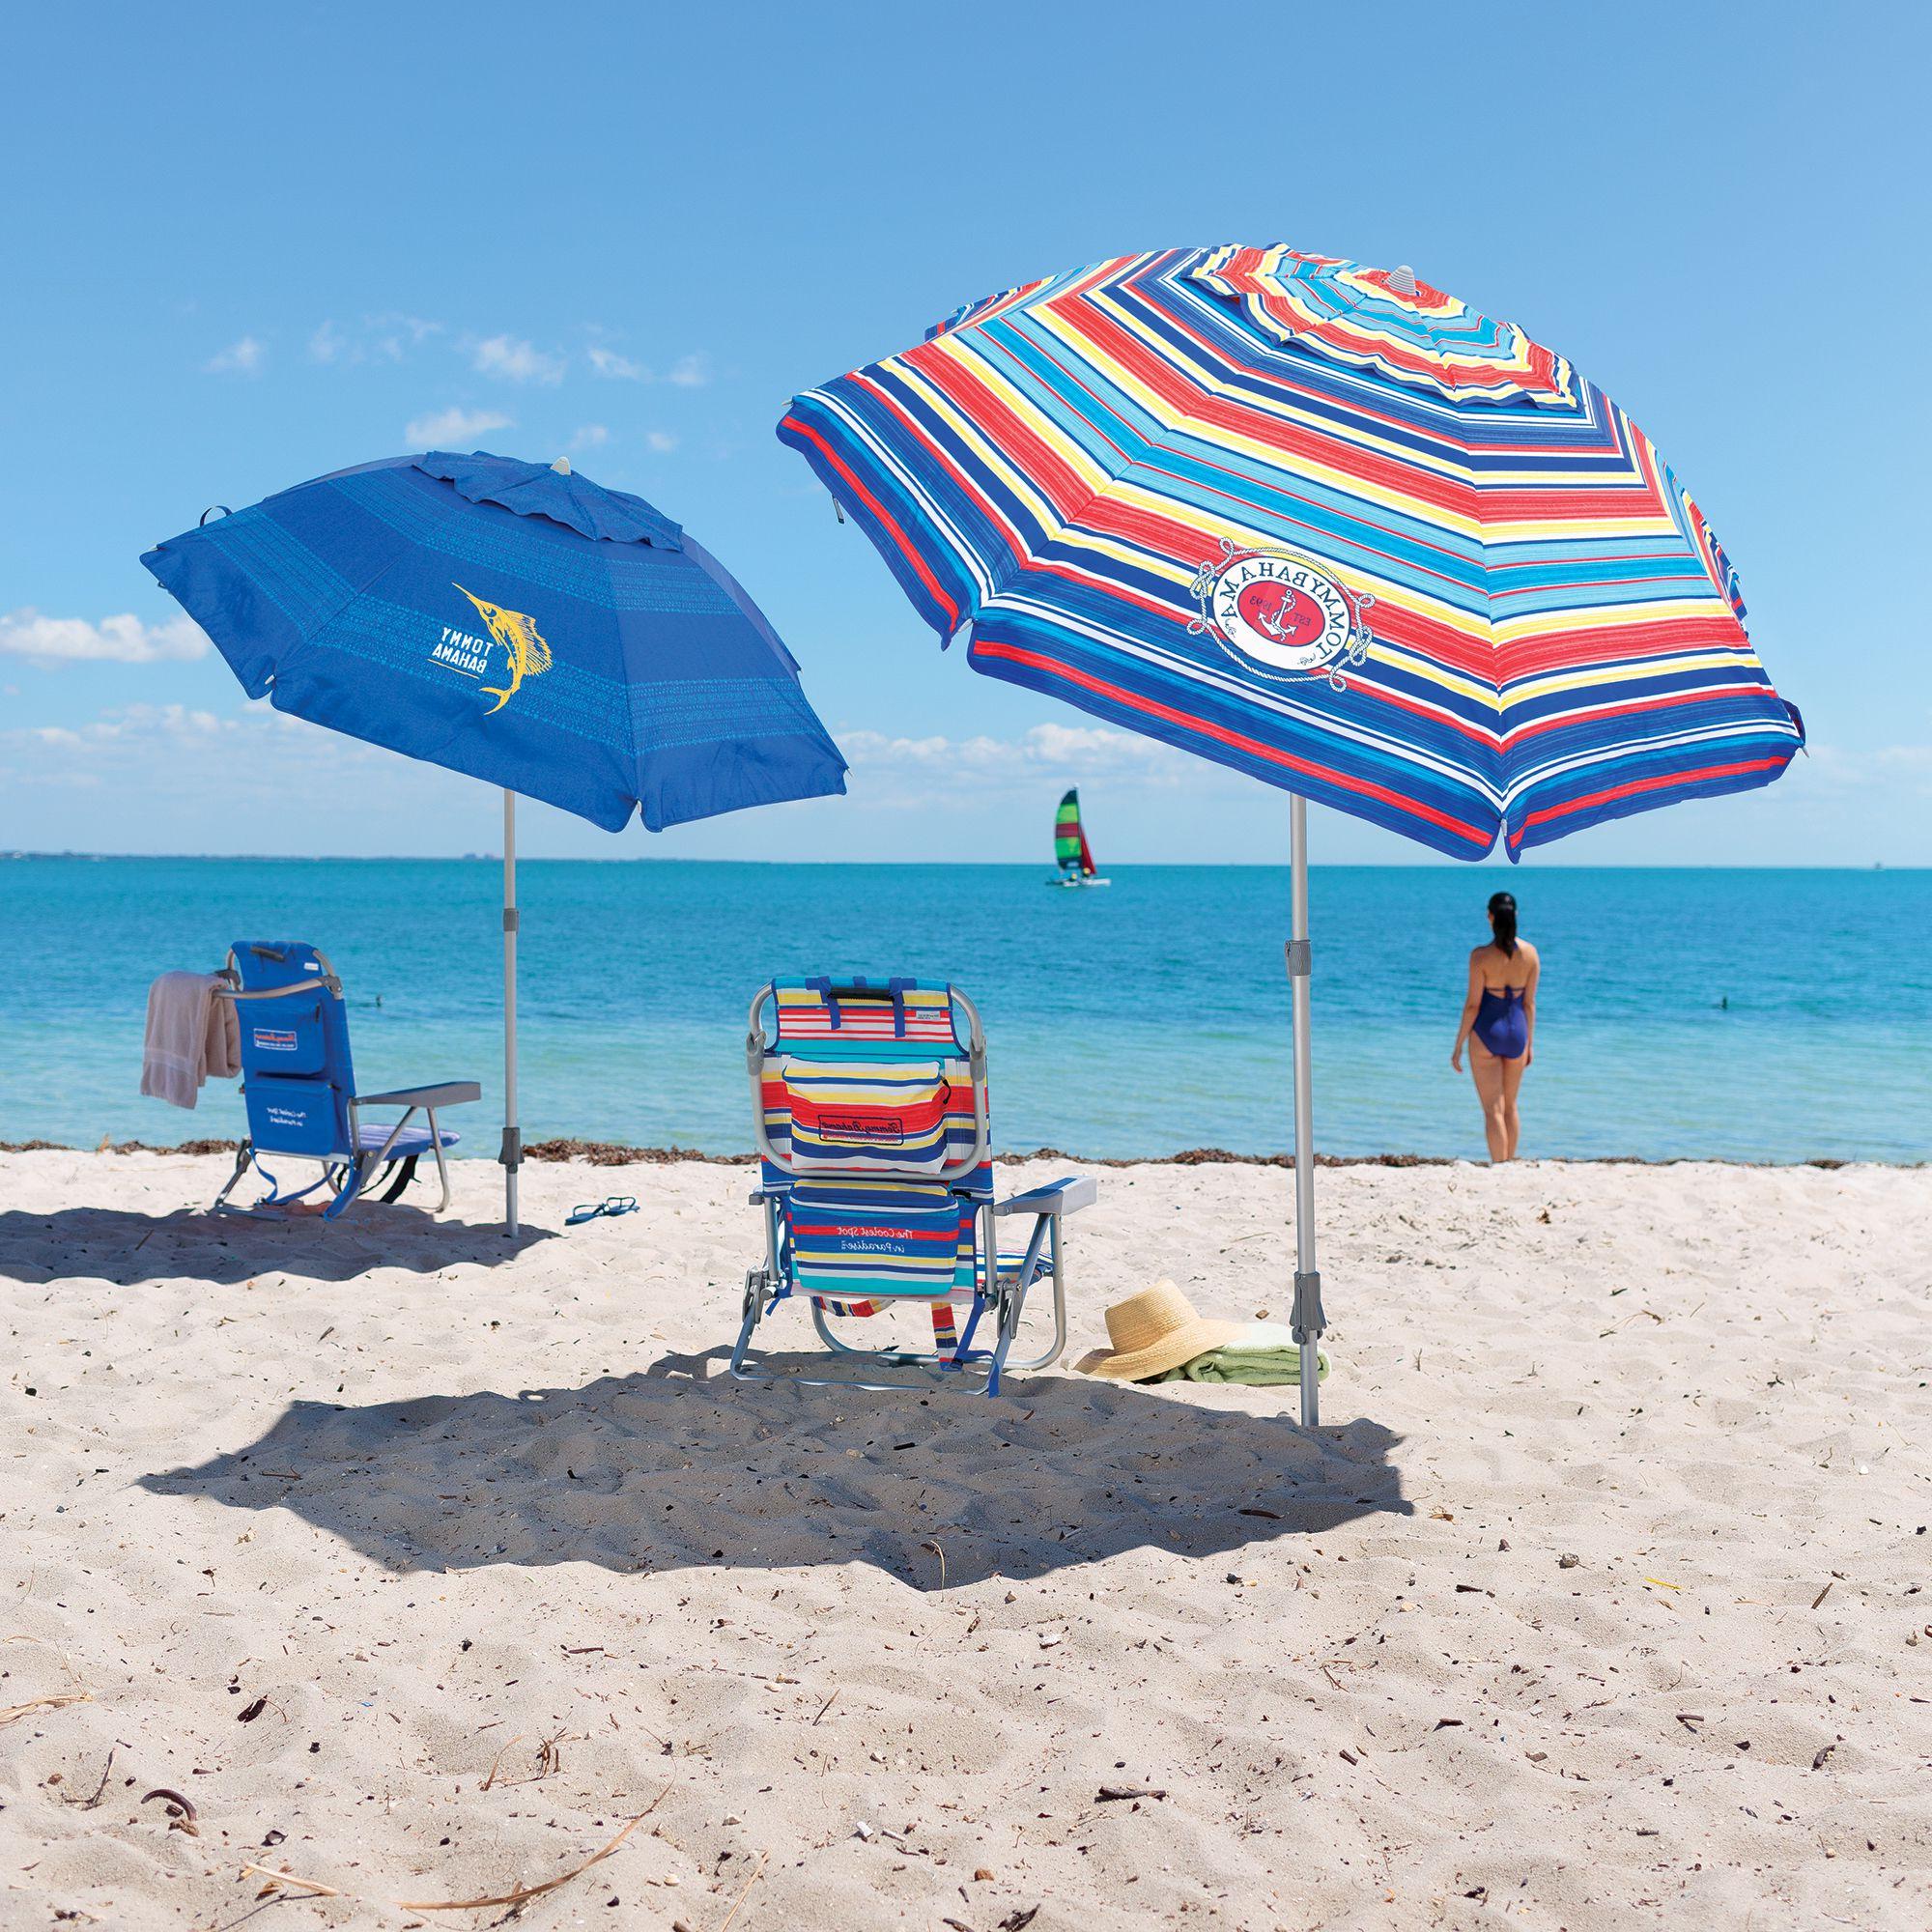 Latest Tommy Bahama Beach Umbrella Intended For Leasure Fiberglass Portable Beach Umbrellas (Gallery 9 of 20)